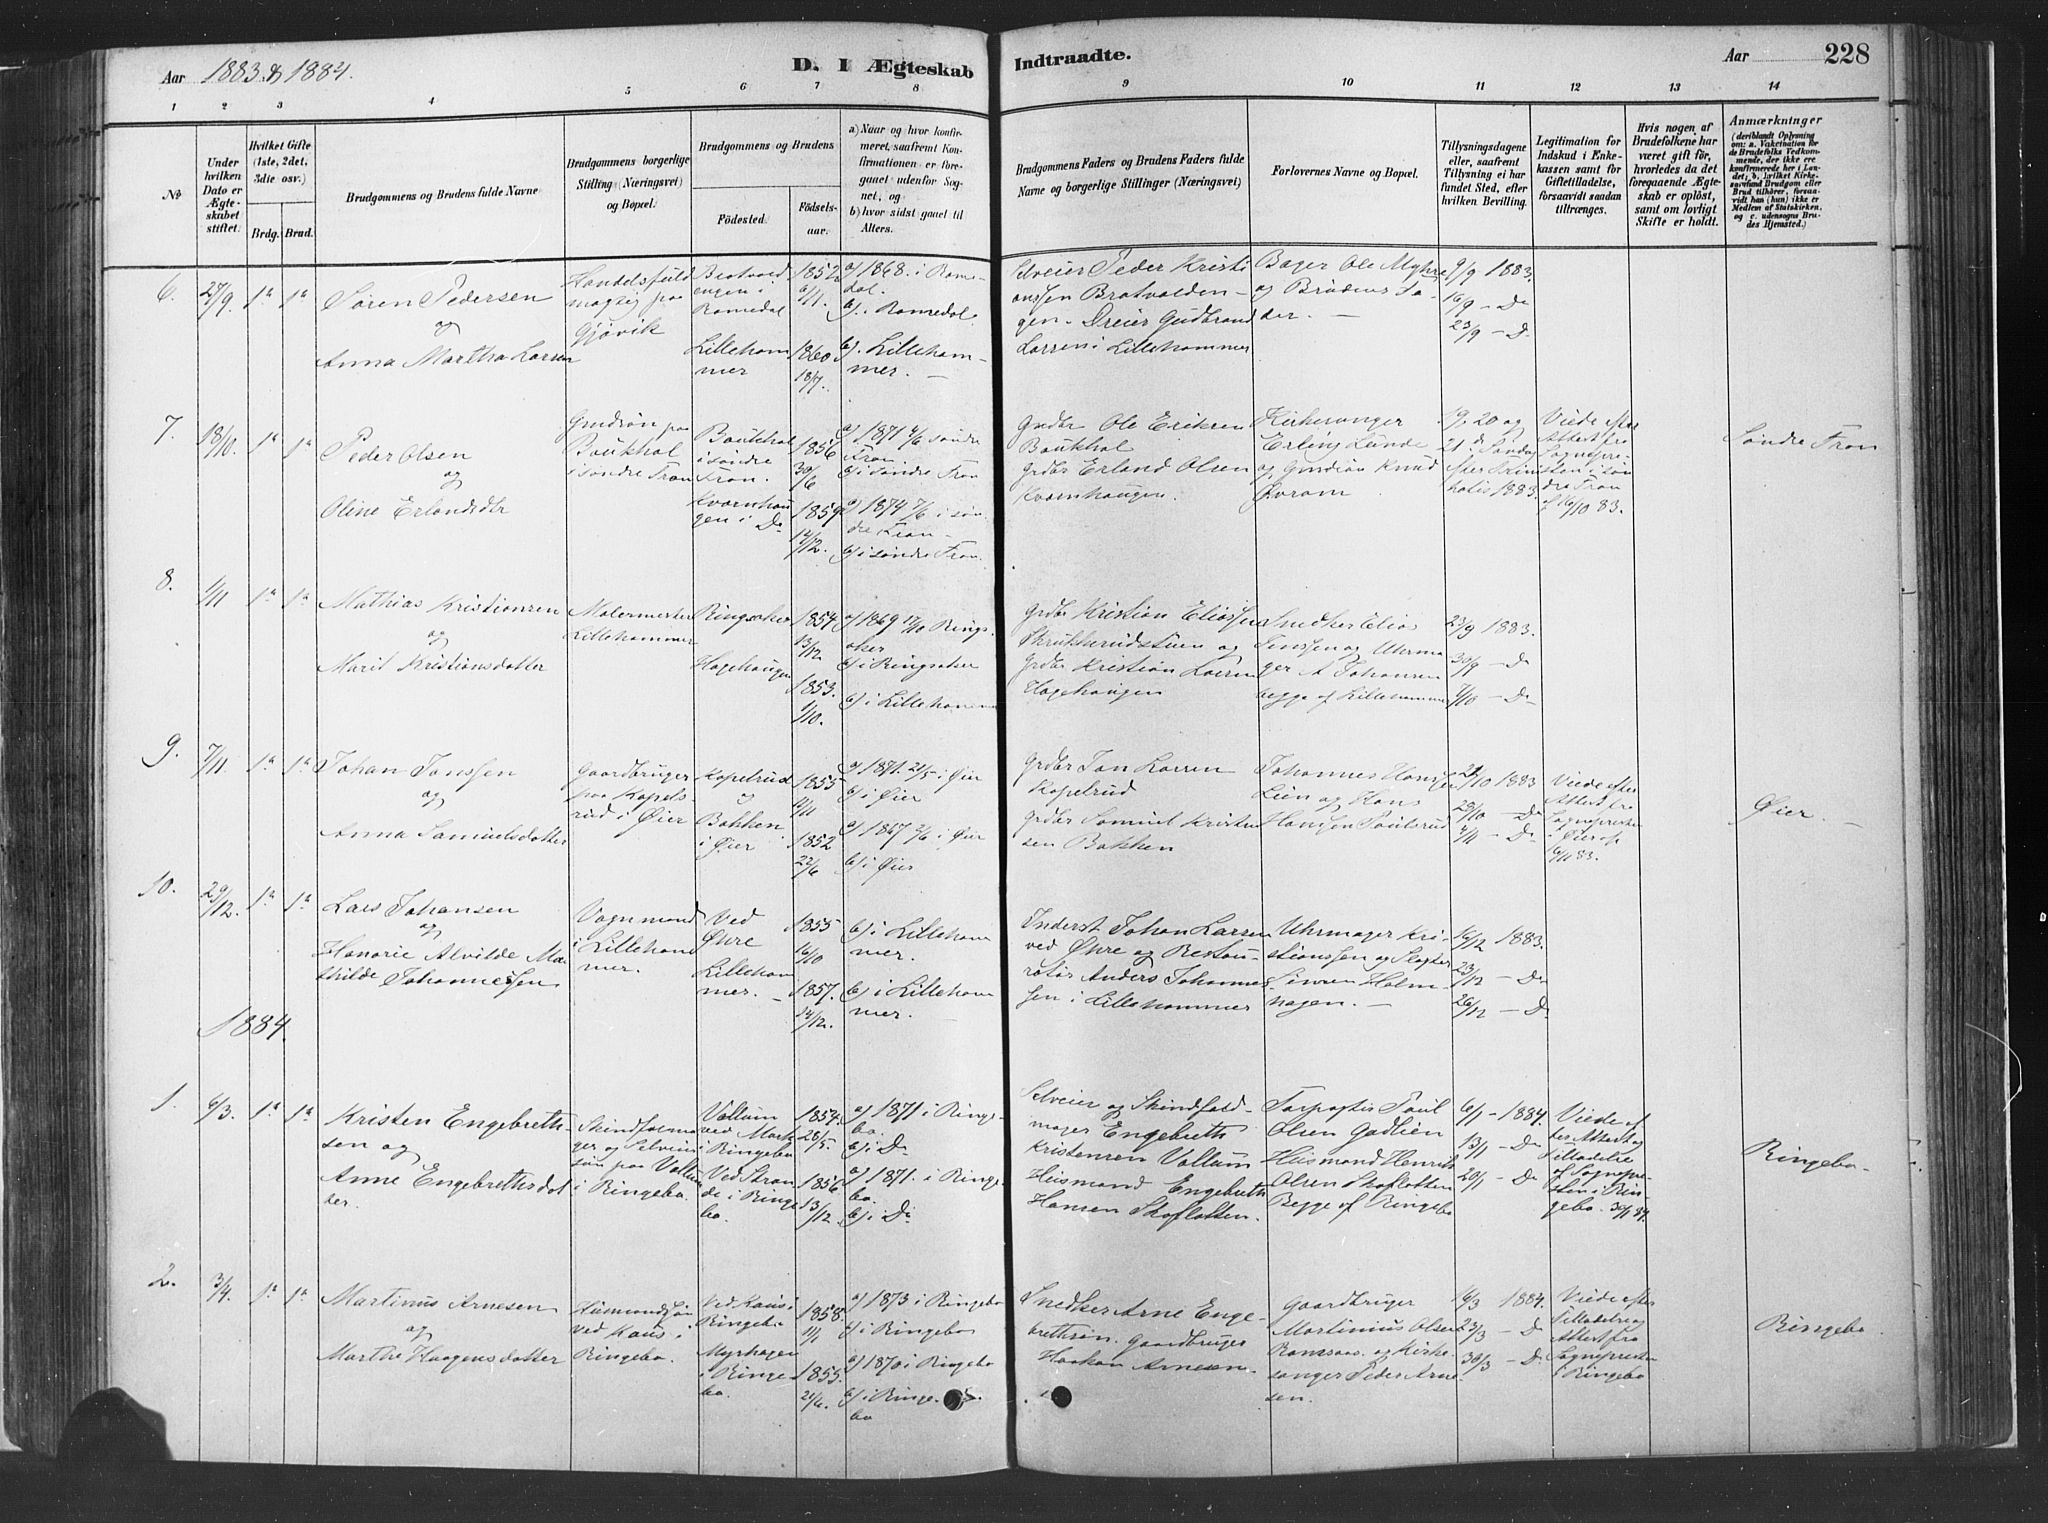 SAH, Fåberg prestekontor, H/Ha/Haa/L0010: Ministerialbok nr. 10, 1879-1900, s. 228